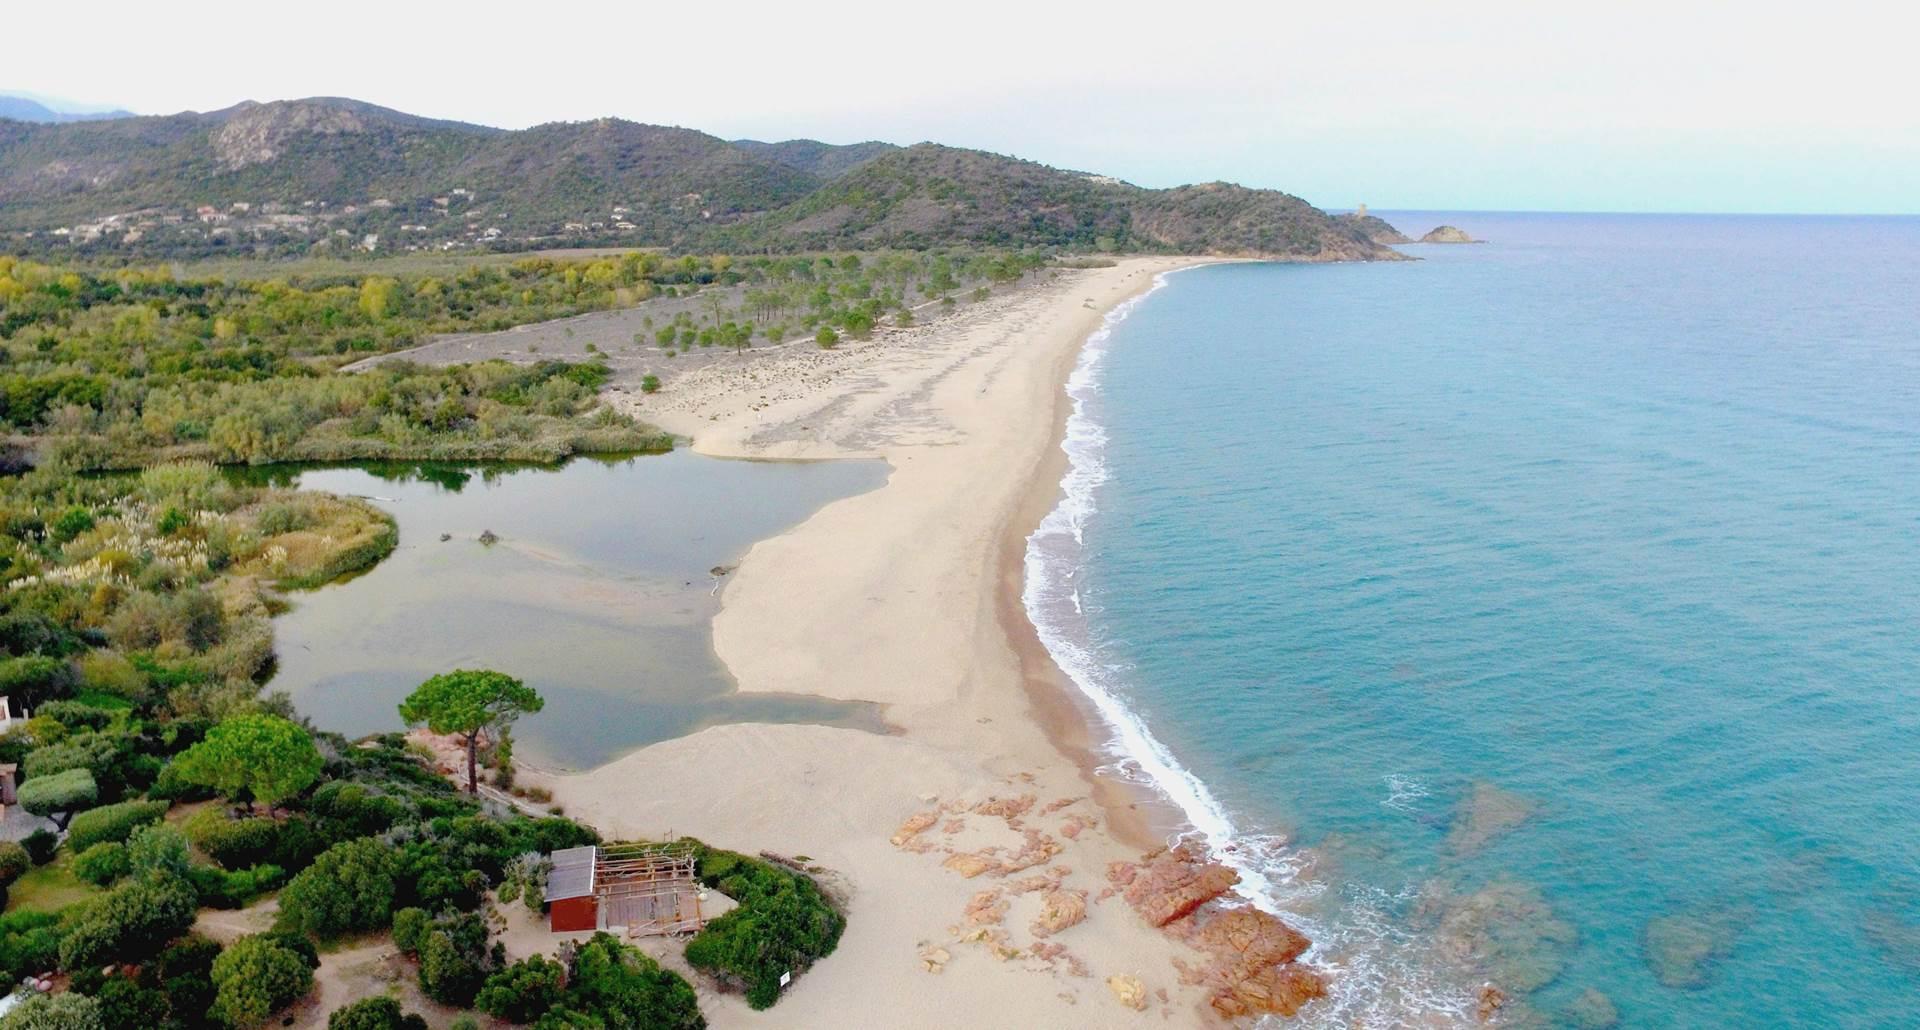 Vue aérienne plage de l'Ovu Santu à 400 m